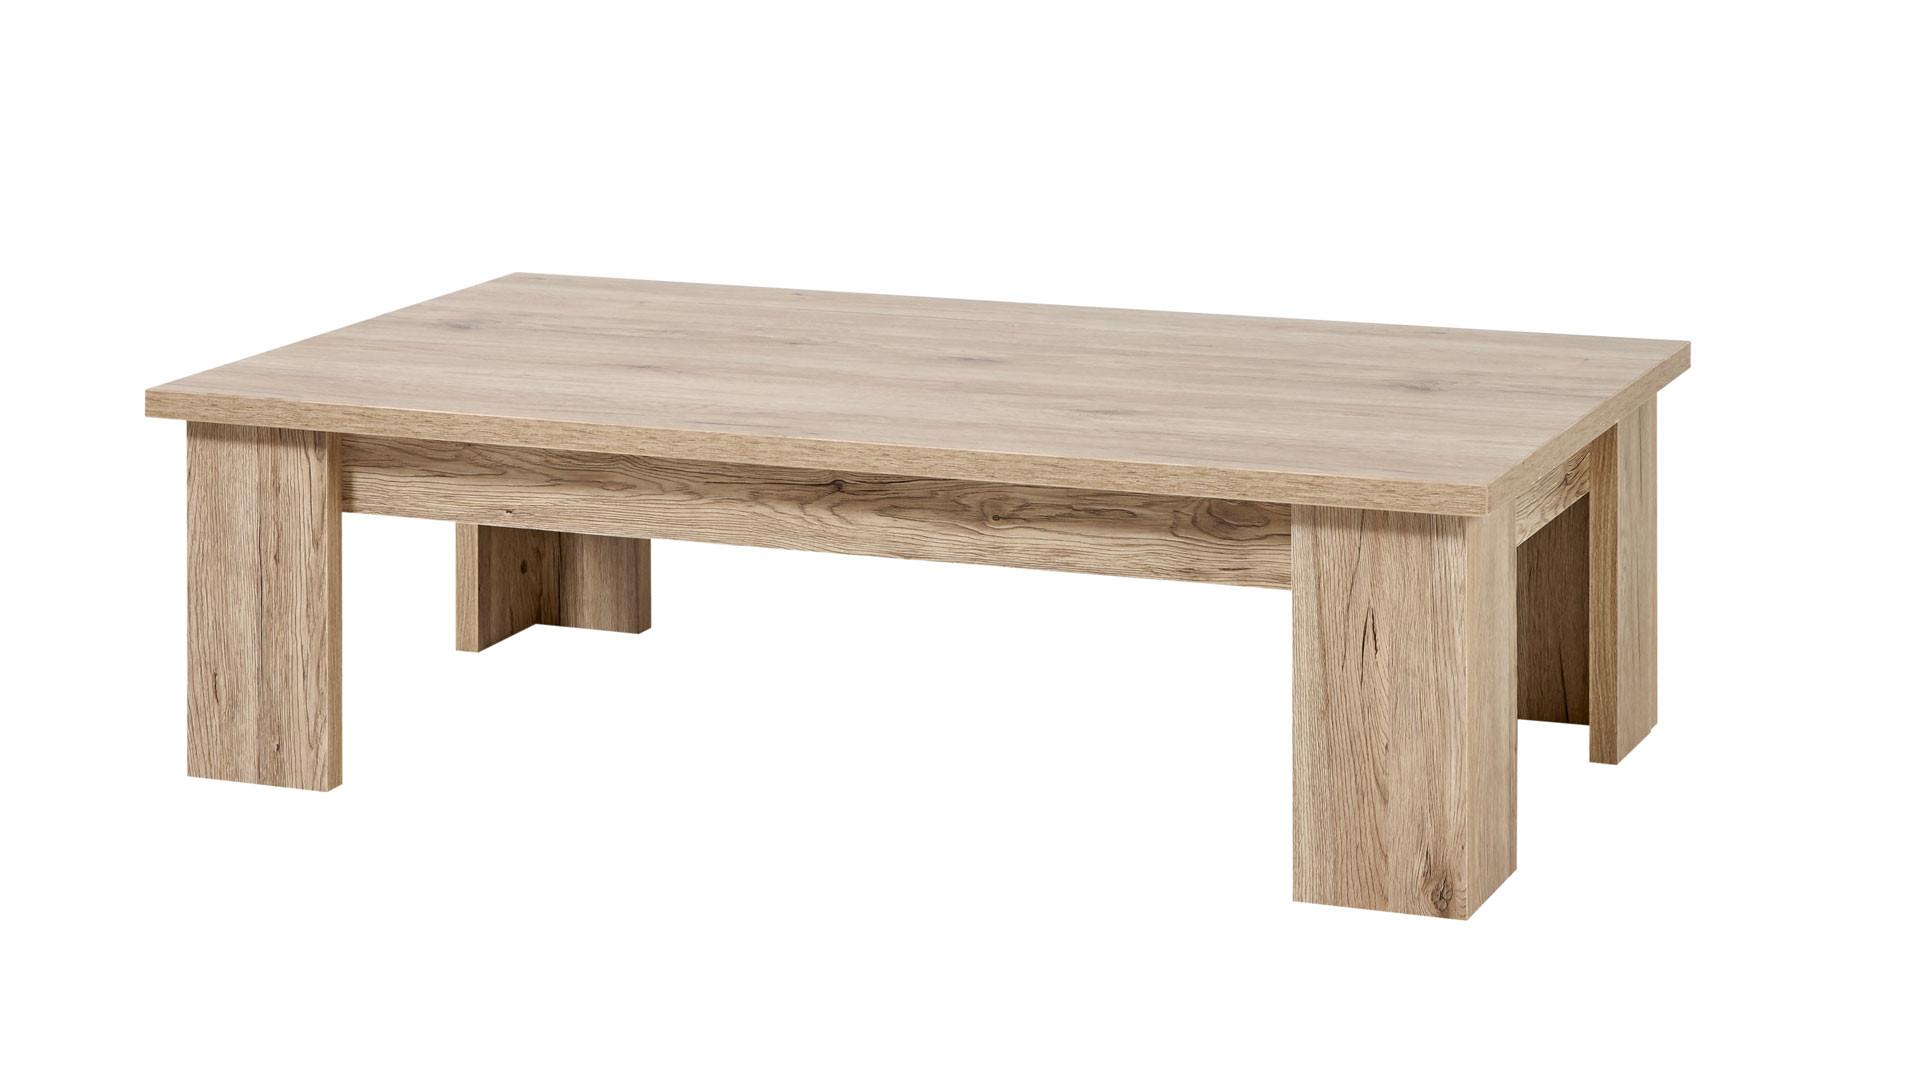 Table basse contemporaine chêne sanremo Arielle